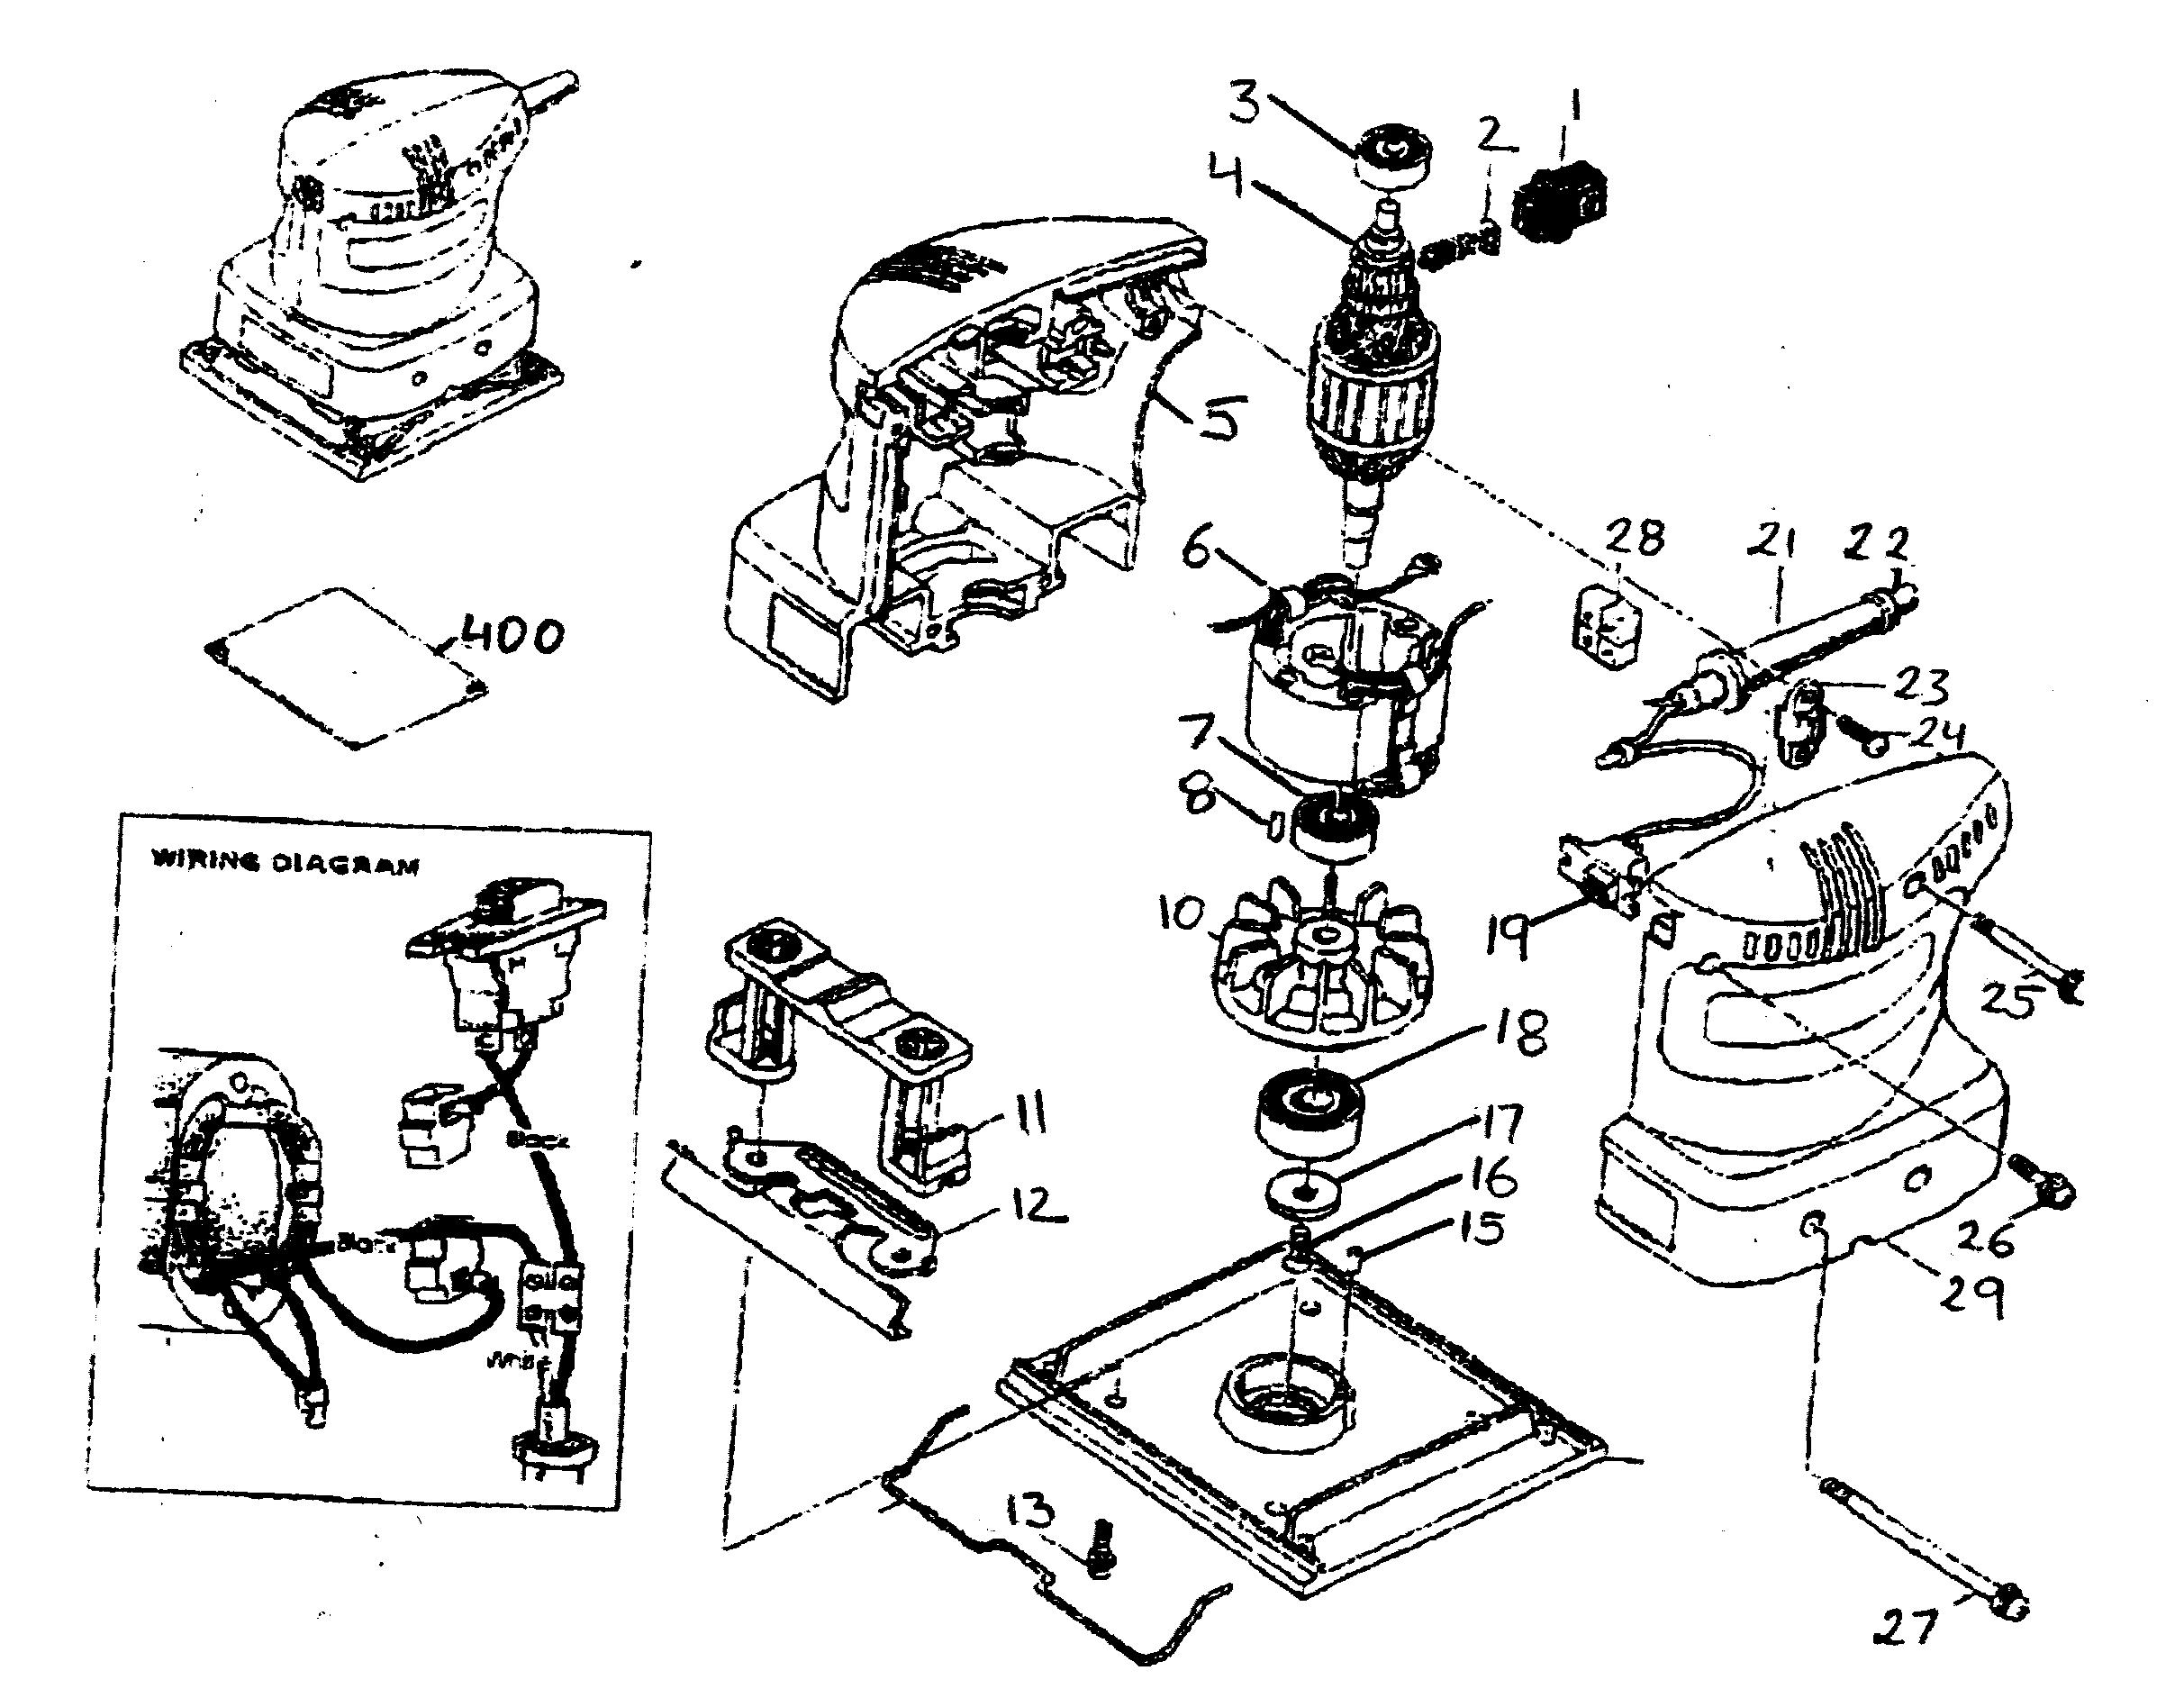 Makita Orbital Sander Wiring Diagram on